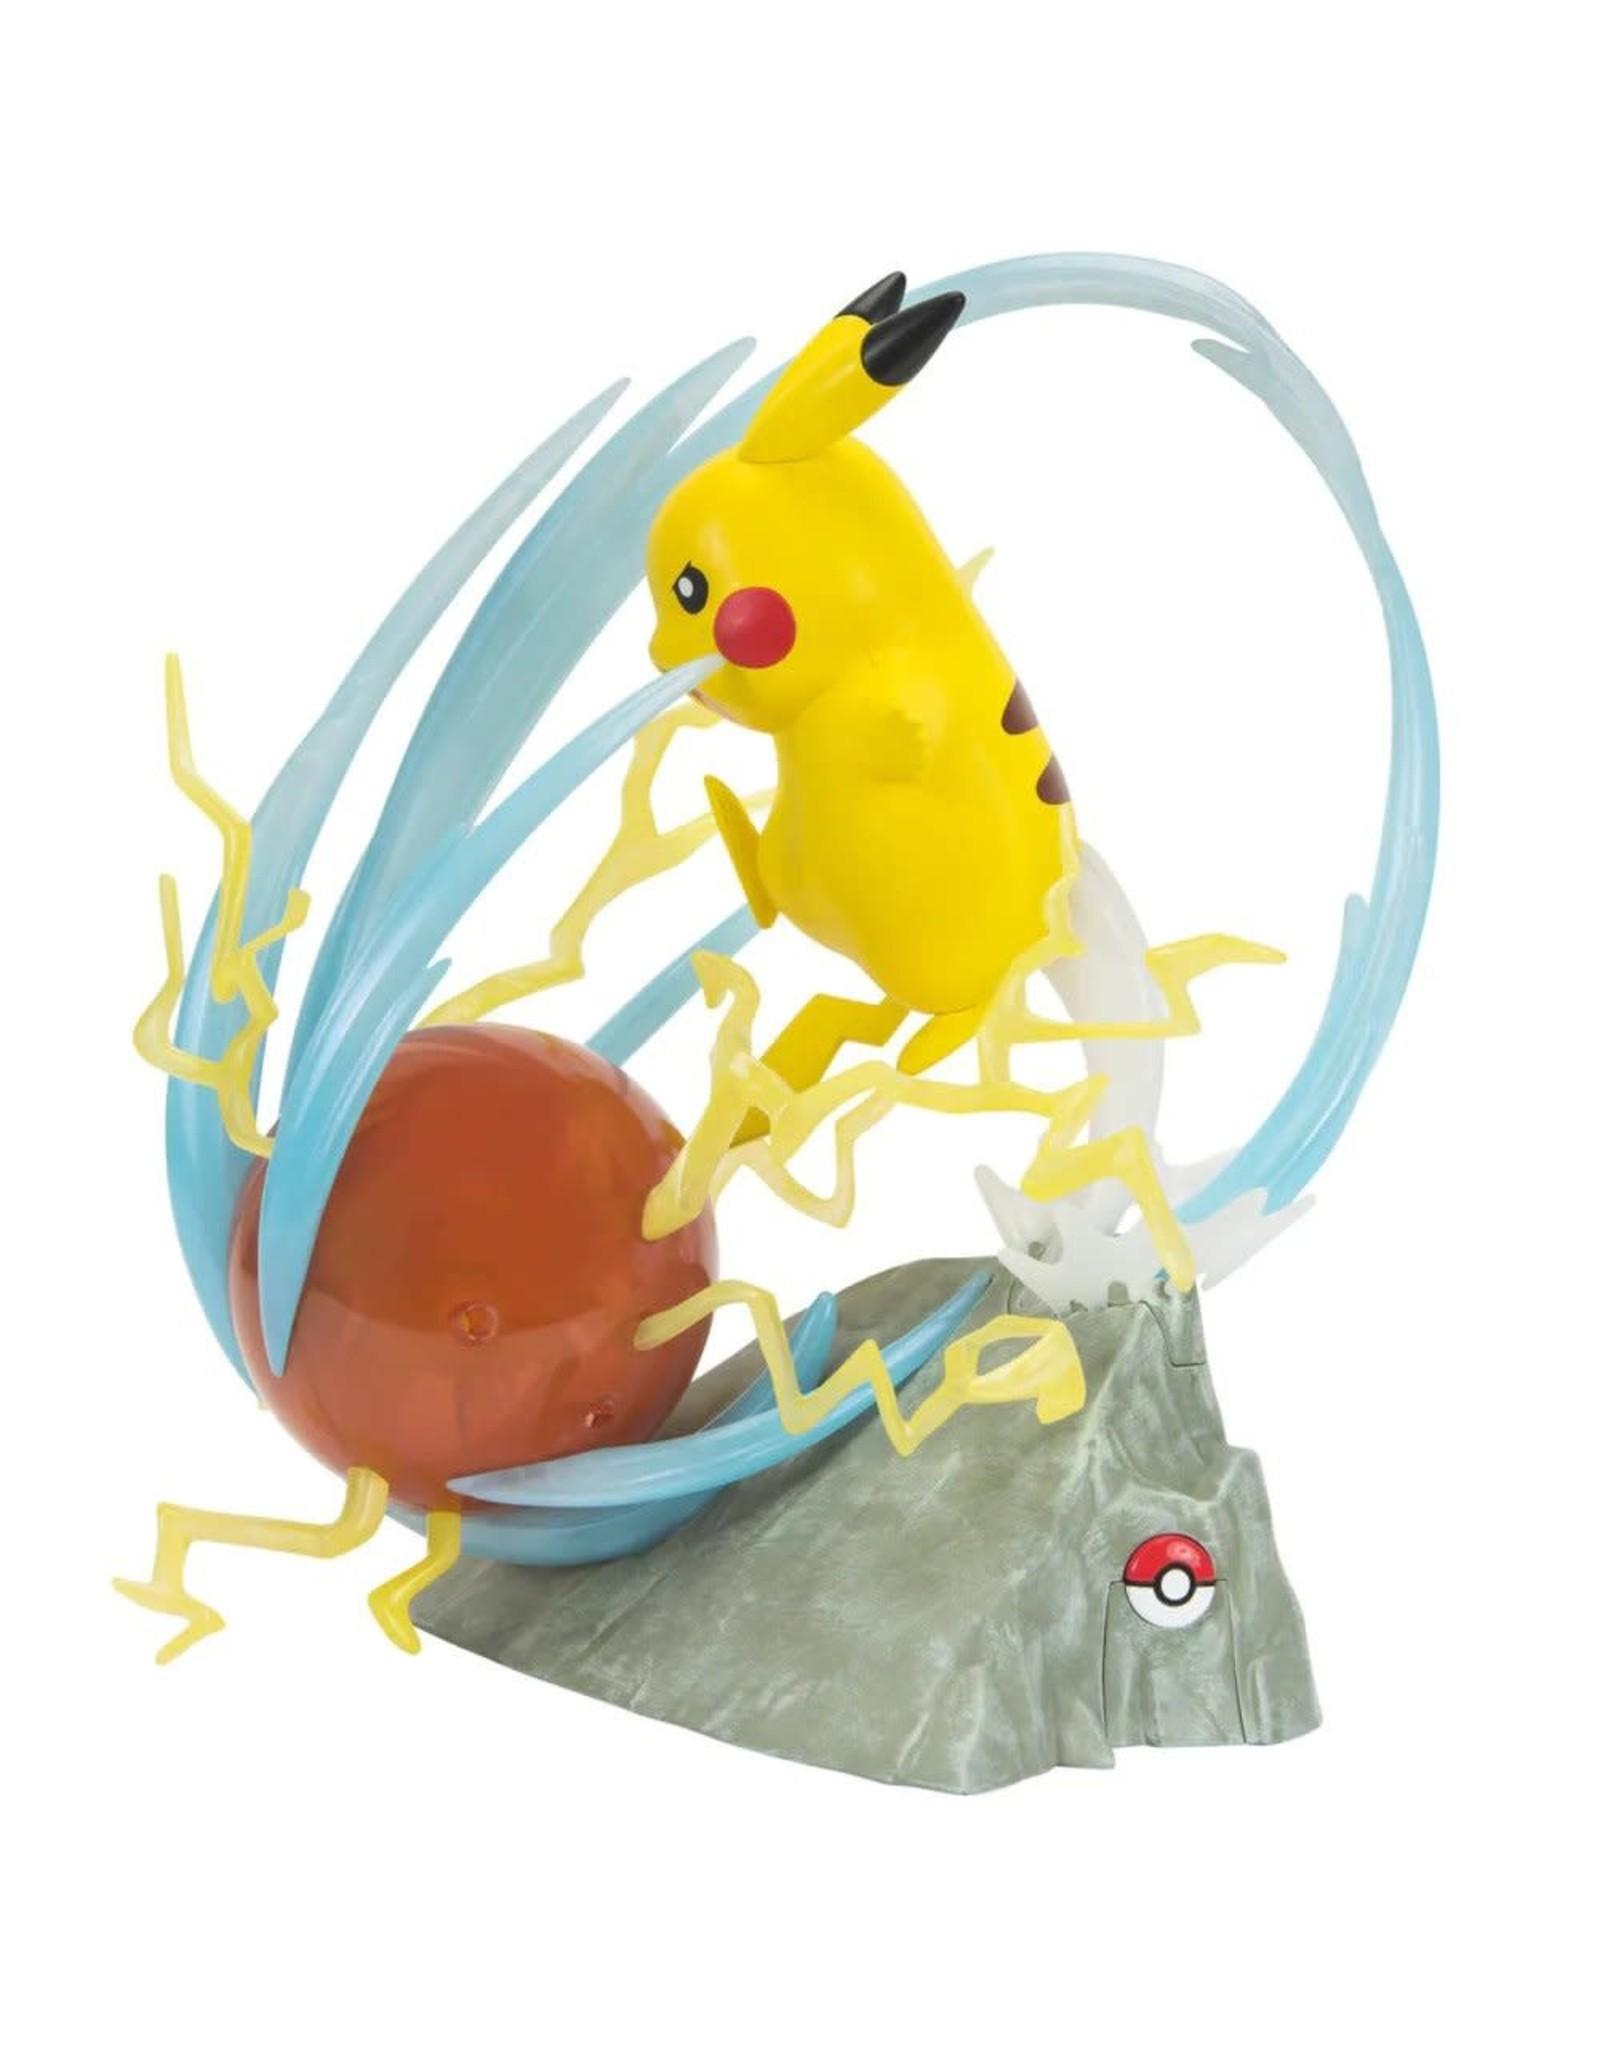 BOTI POKEMON 25th anniversary Light-Up Deluxe Statue 33cm - Pikachu